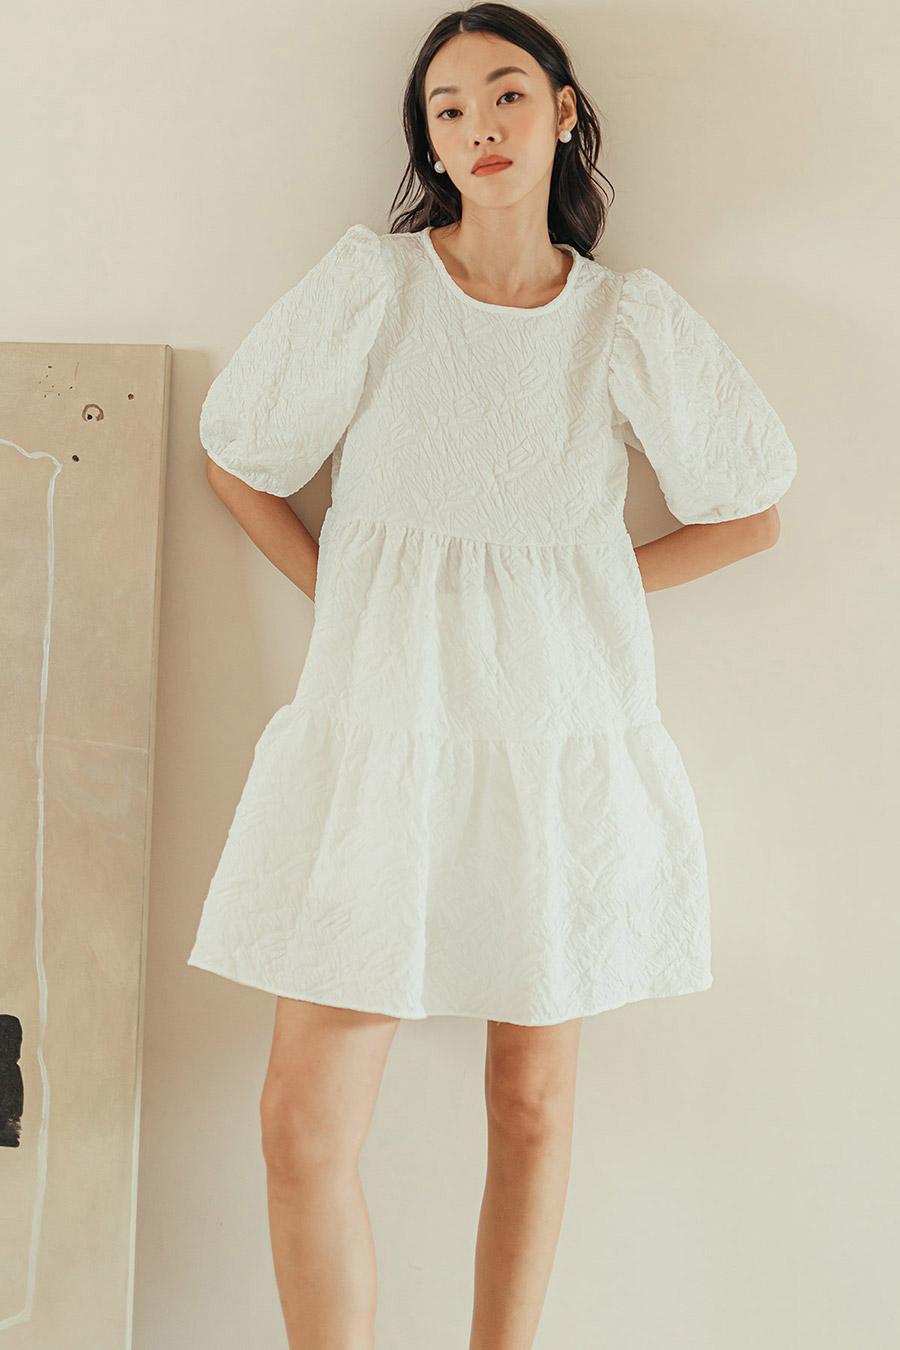 CAPON DRESS - IVORY